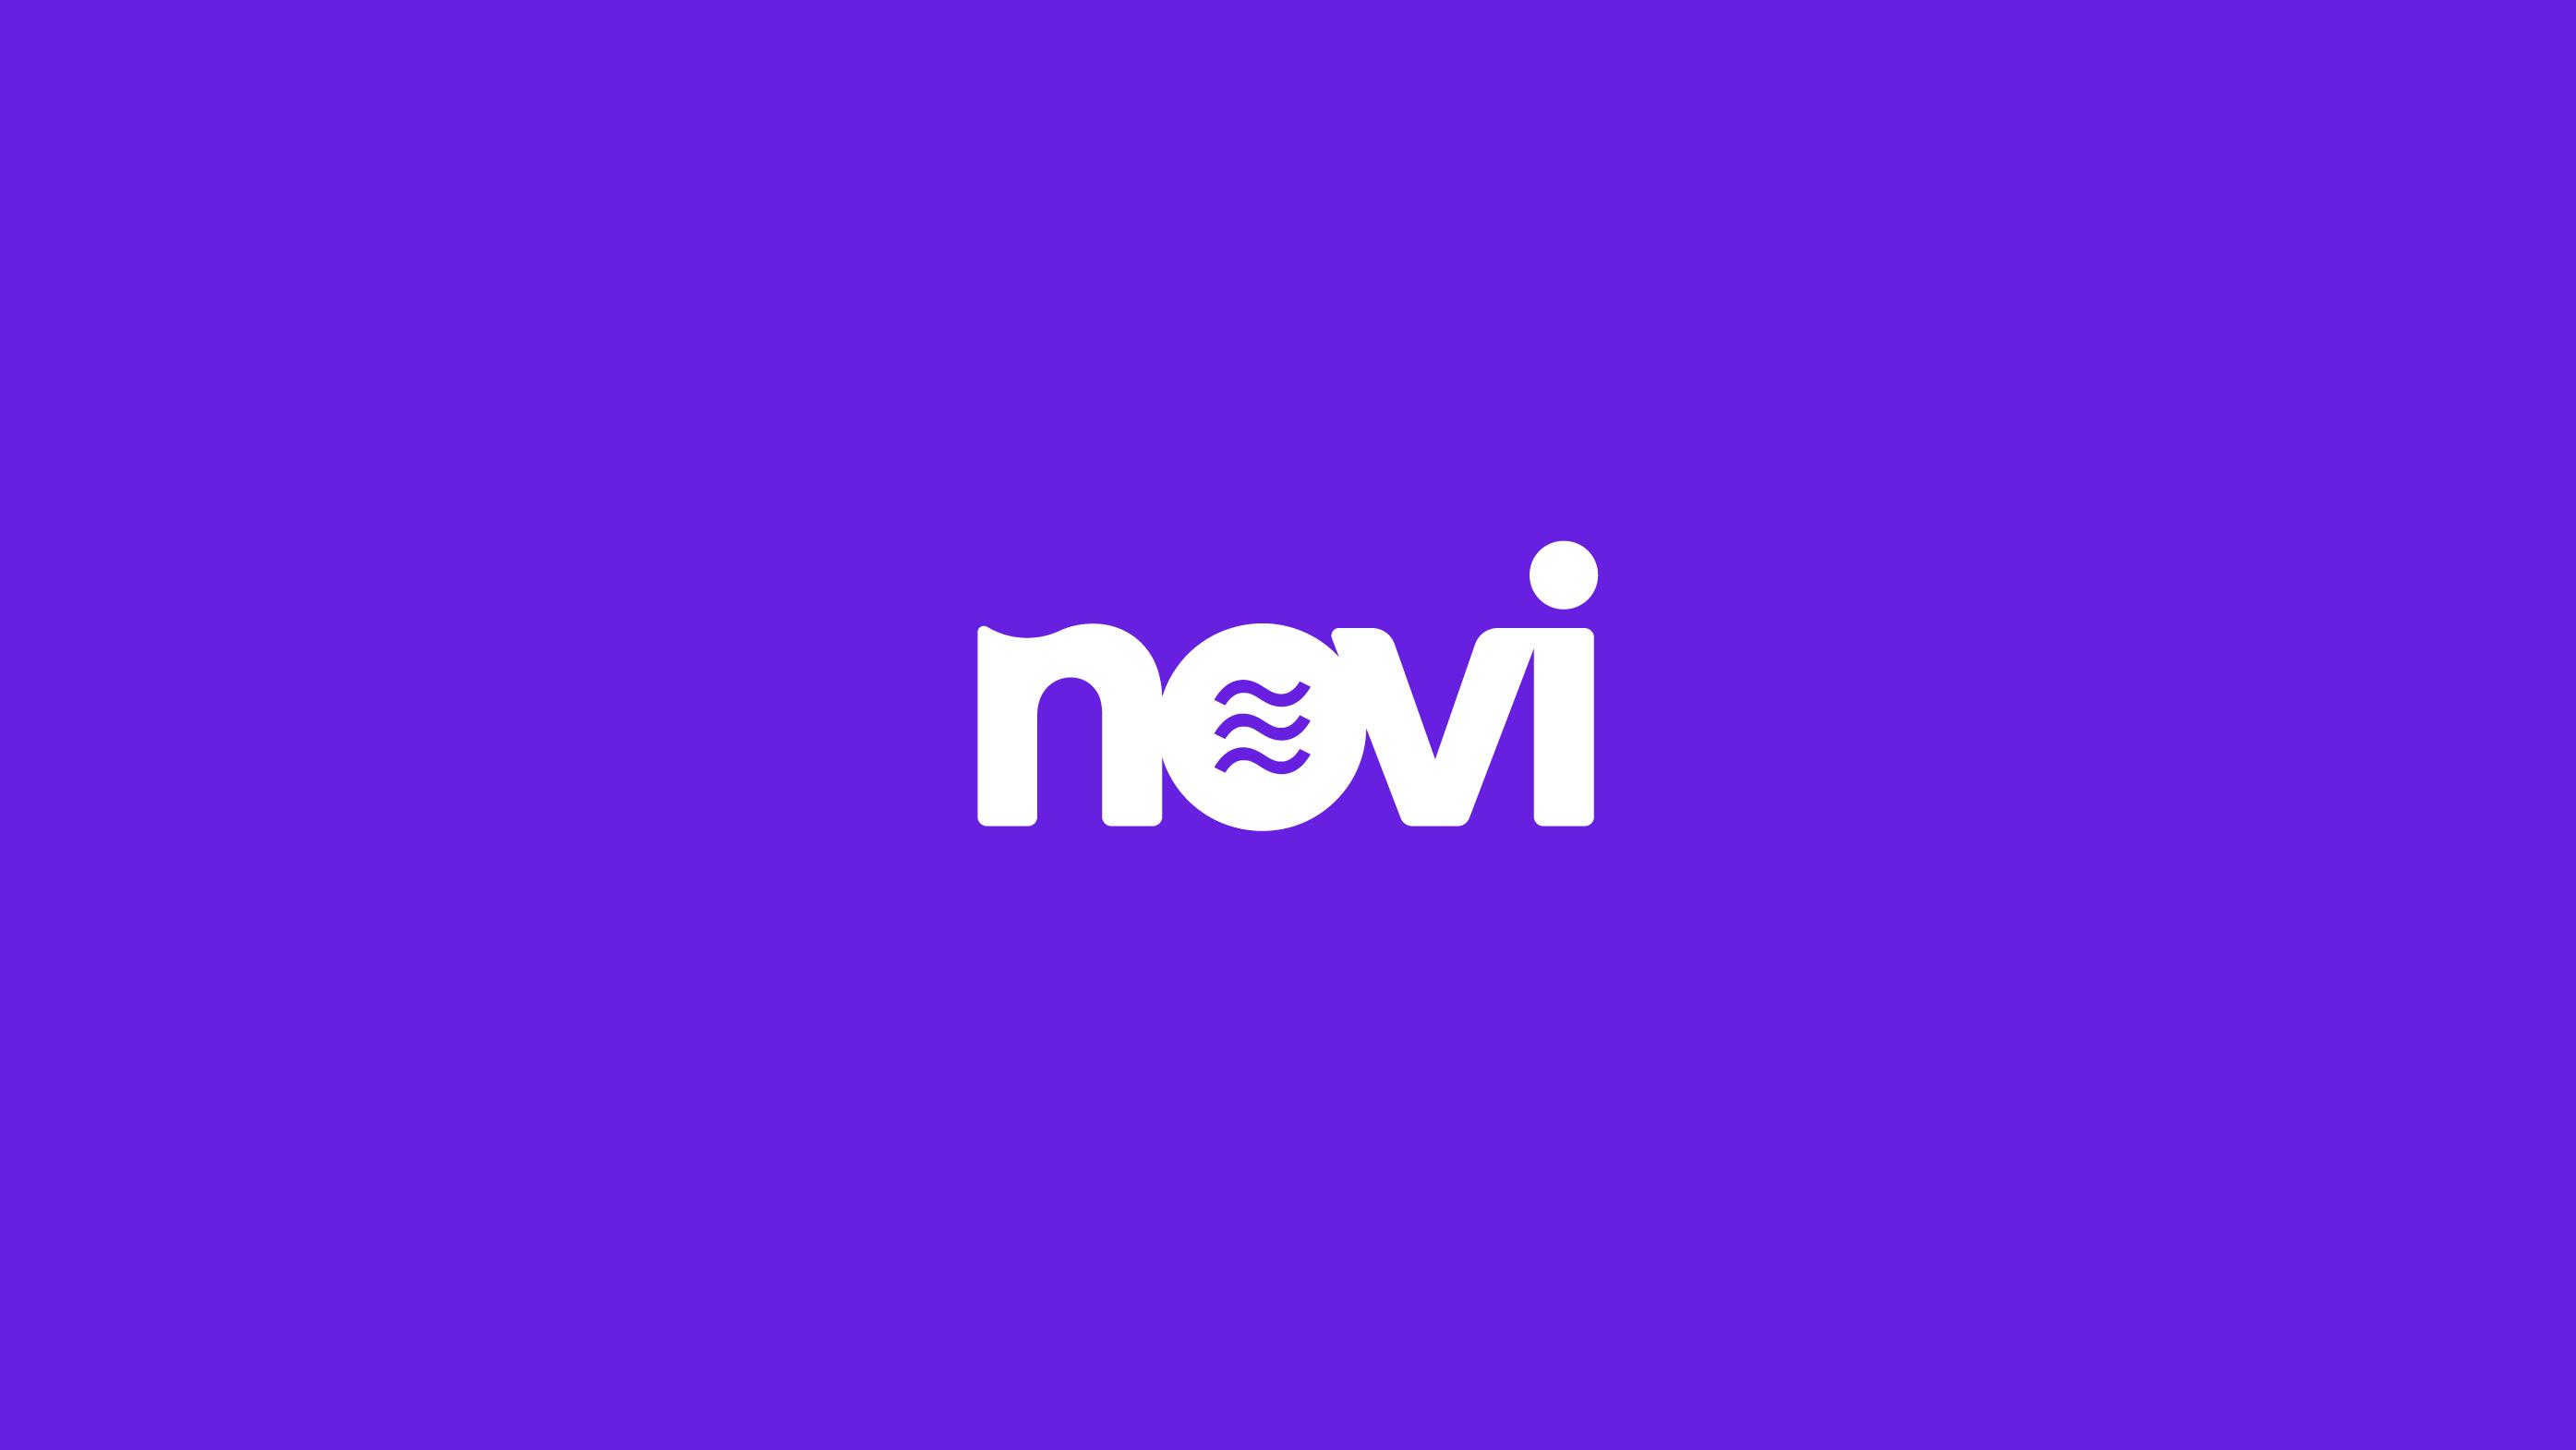 Novi wordmark